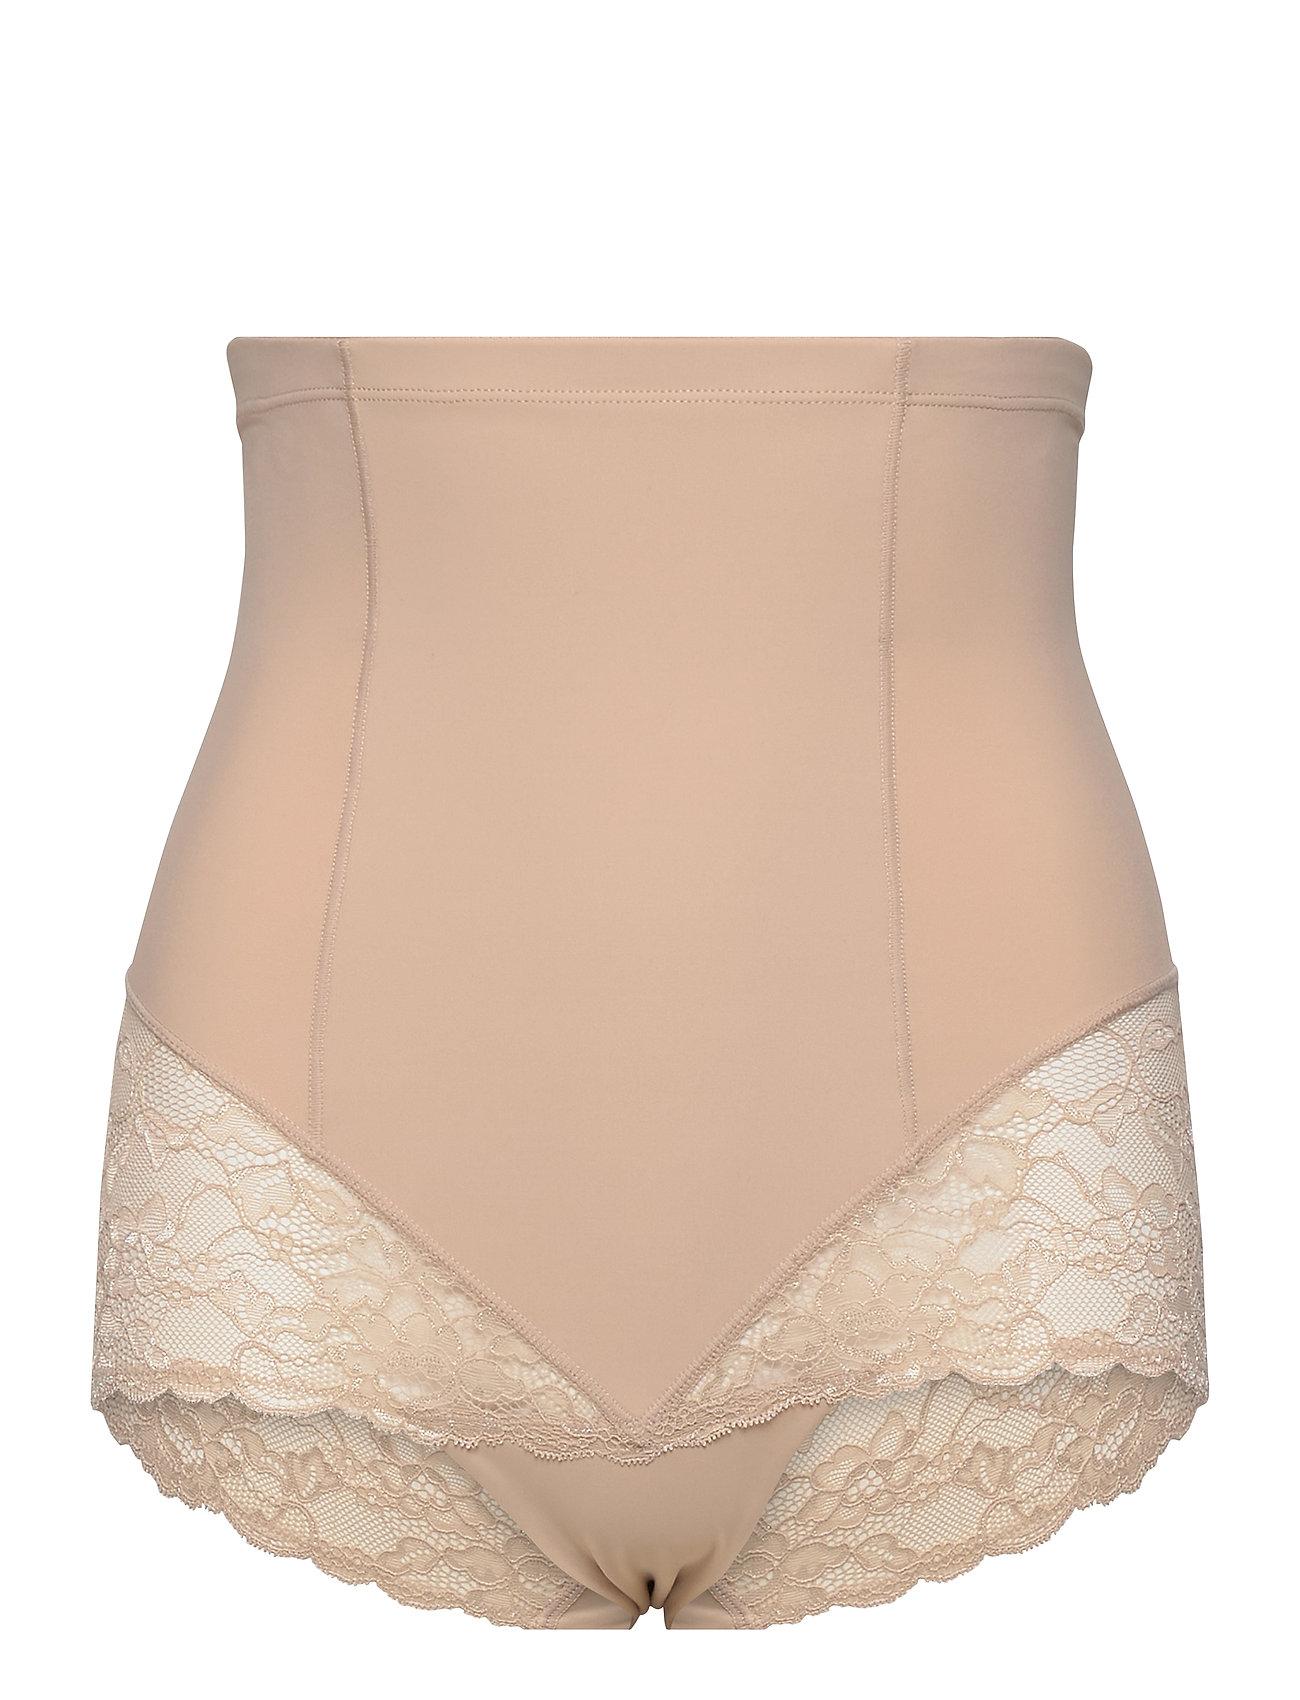 Girdle Highwaist Kim Lace Lingerie Shapewear Bottoms Beige Lindex